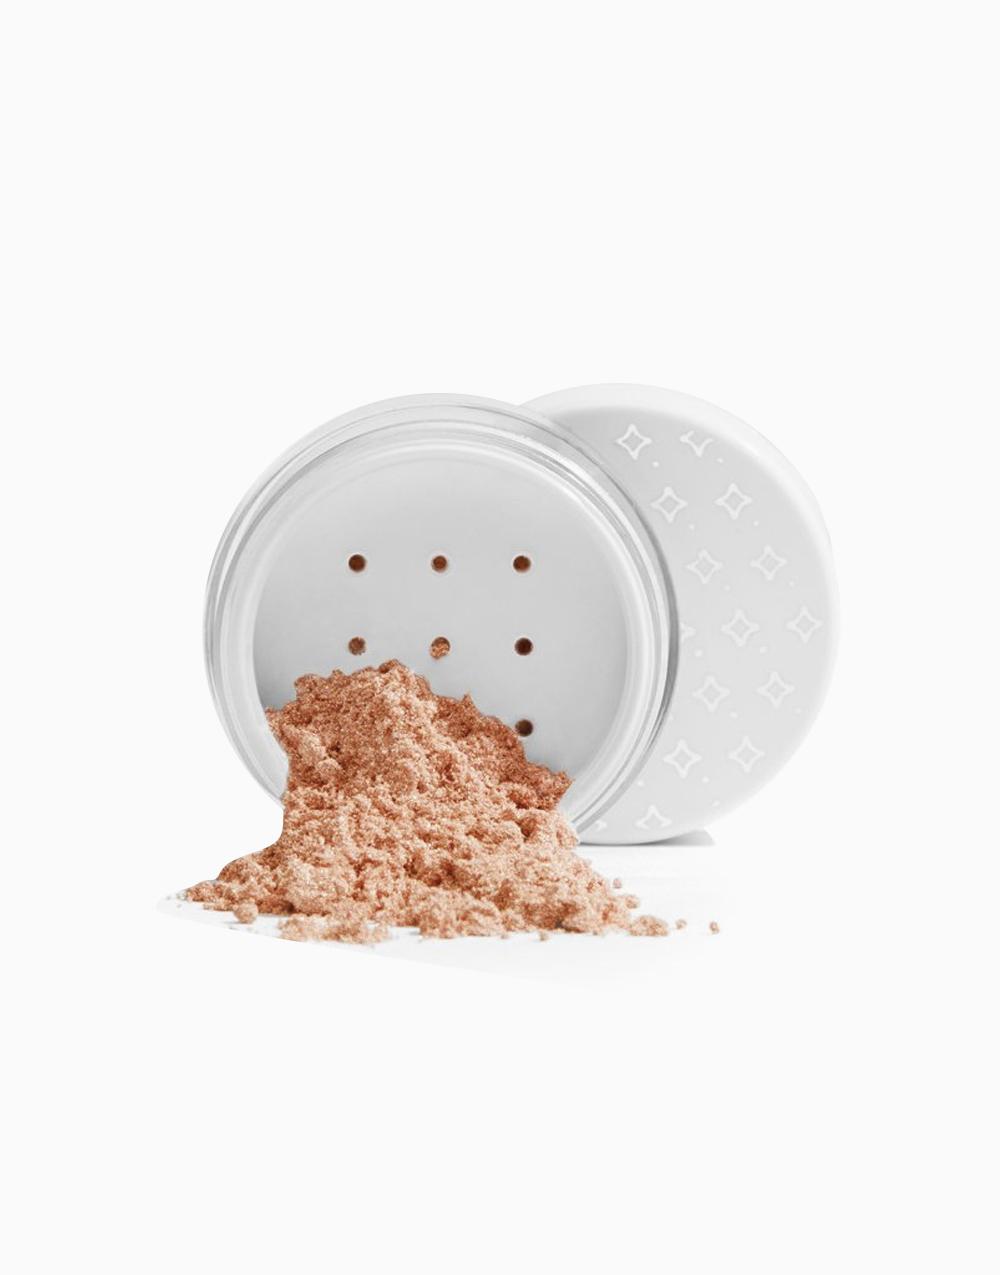 Luster Dust Loose Highlighter by ColourPop | Strobe Globe